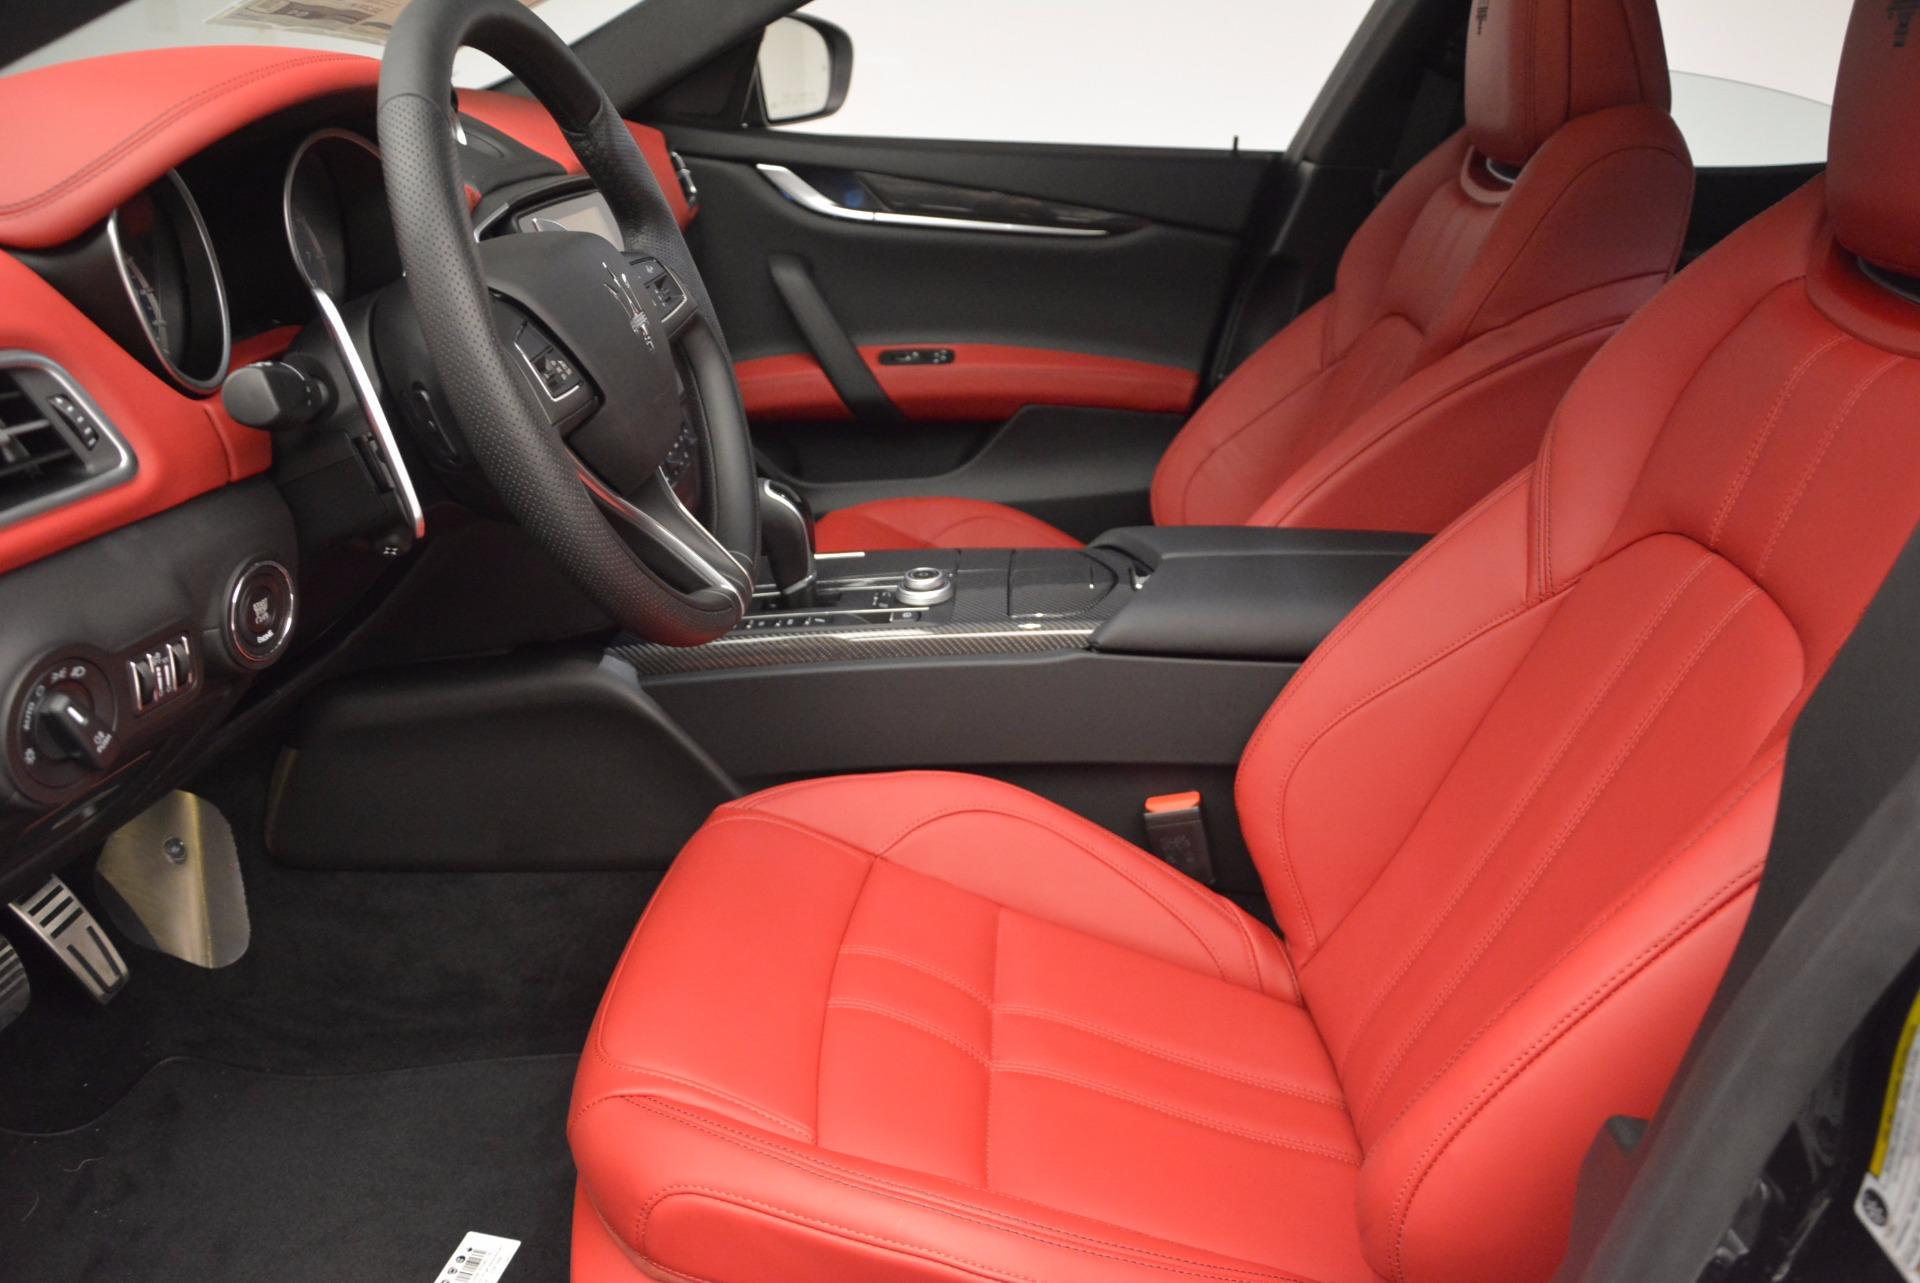 Used 2017 Maserati Ghibli S Q4 For Sale In Greenwich, CT. Alfa Romeo of Greenwich, M1862 1121_p14